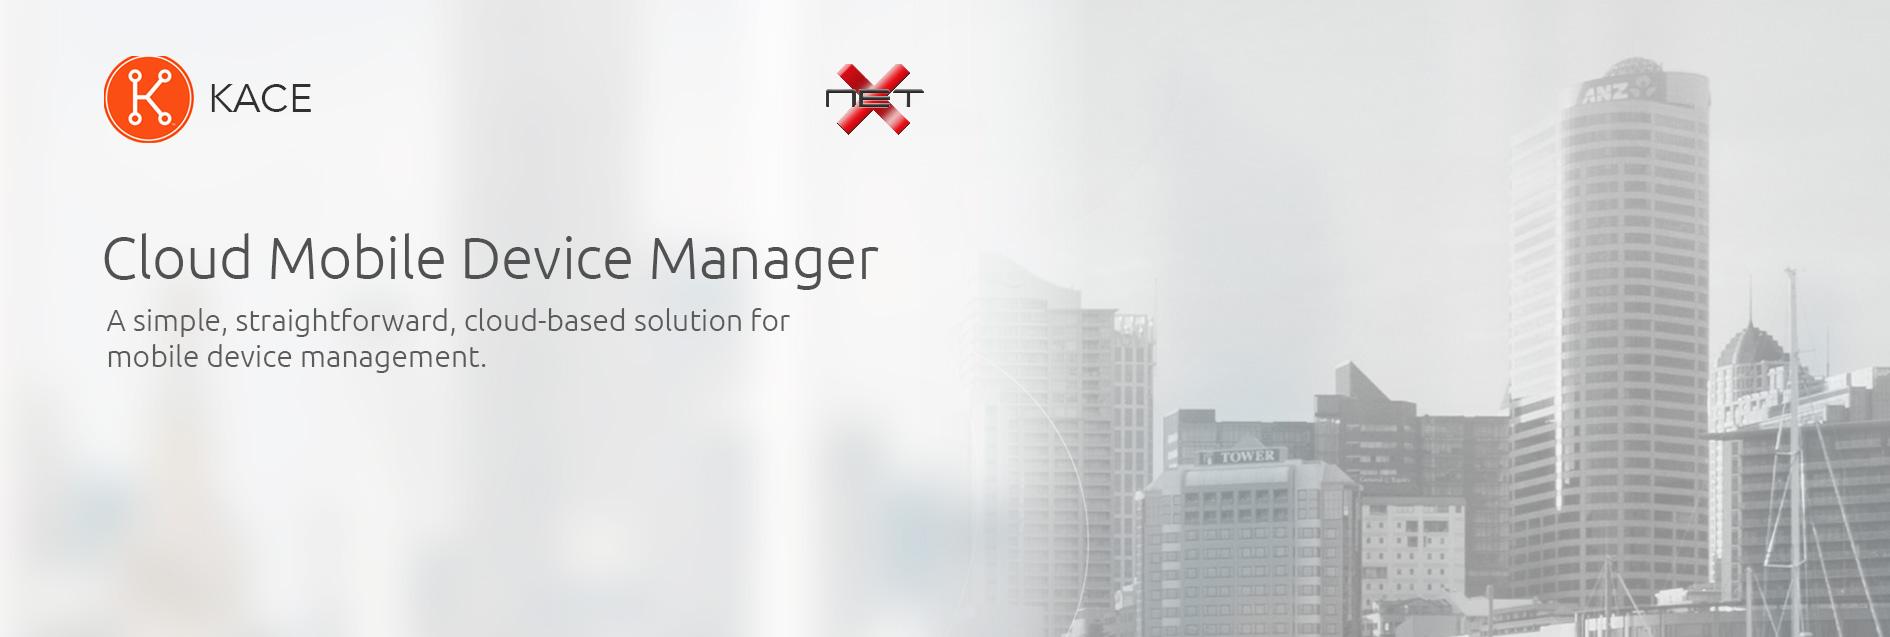 netx kace mobile device manager